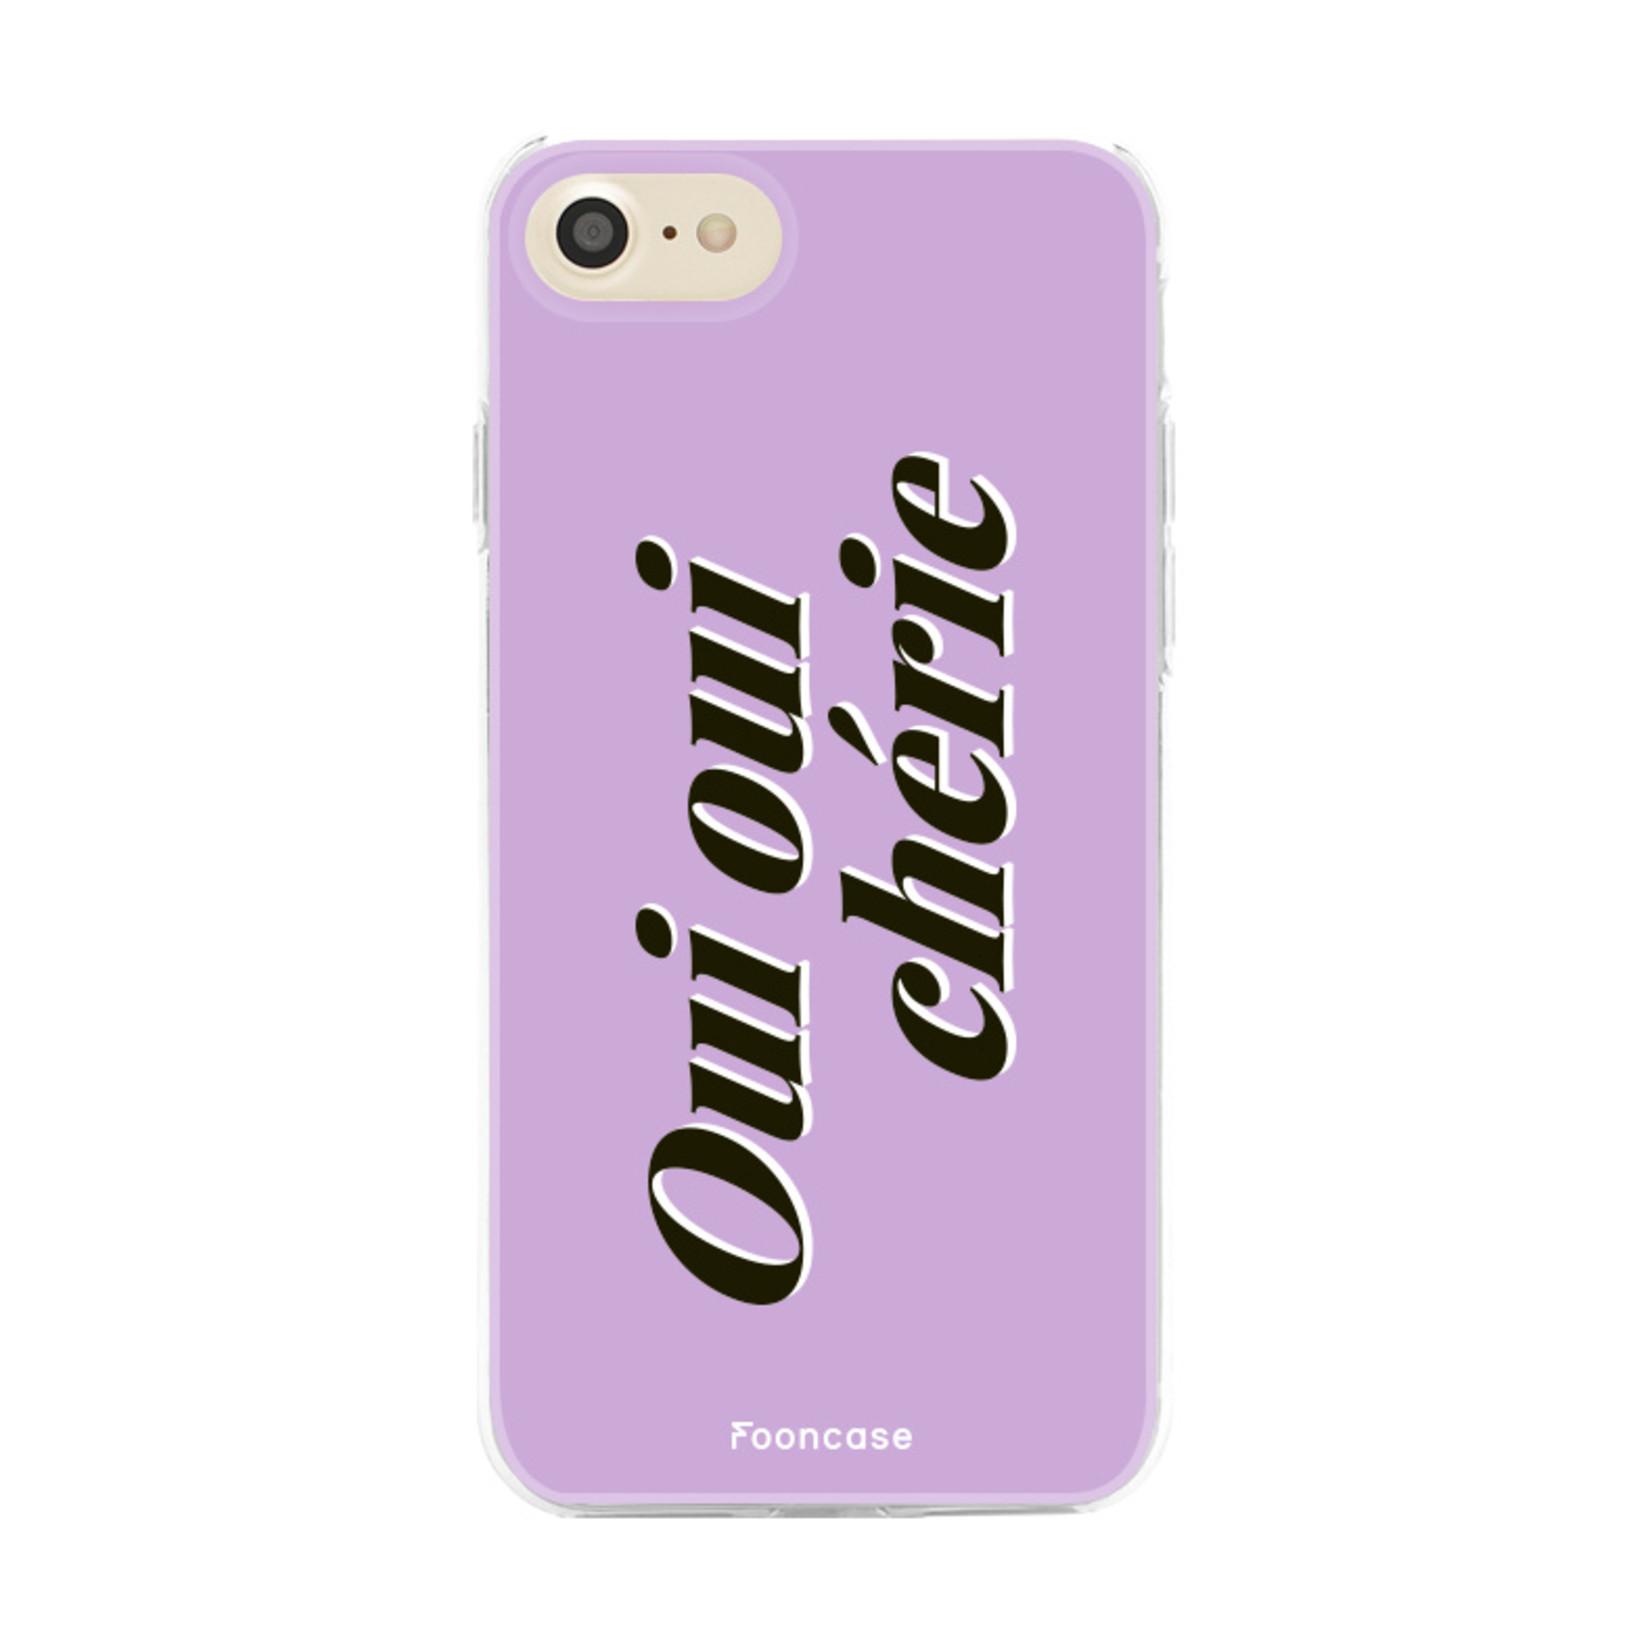 FOONCASE iPhone 8 hoesje TPU Soft Case - Back Cover - Oui Oui Chérie / Lila Paars & Wit